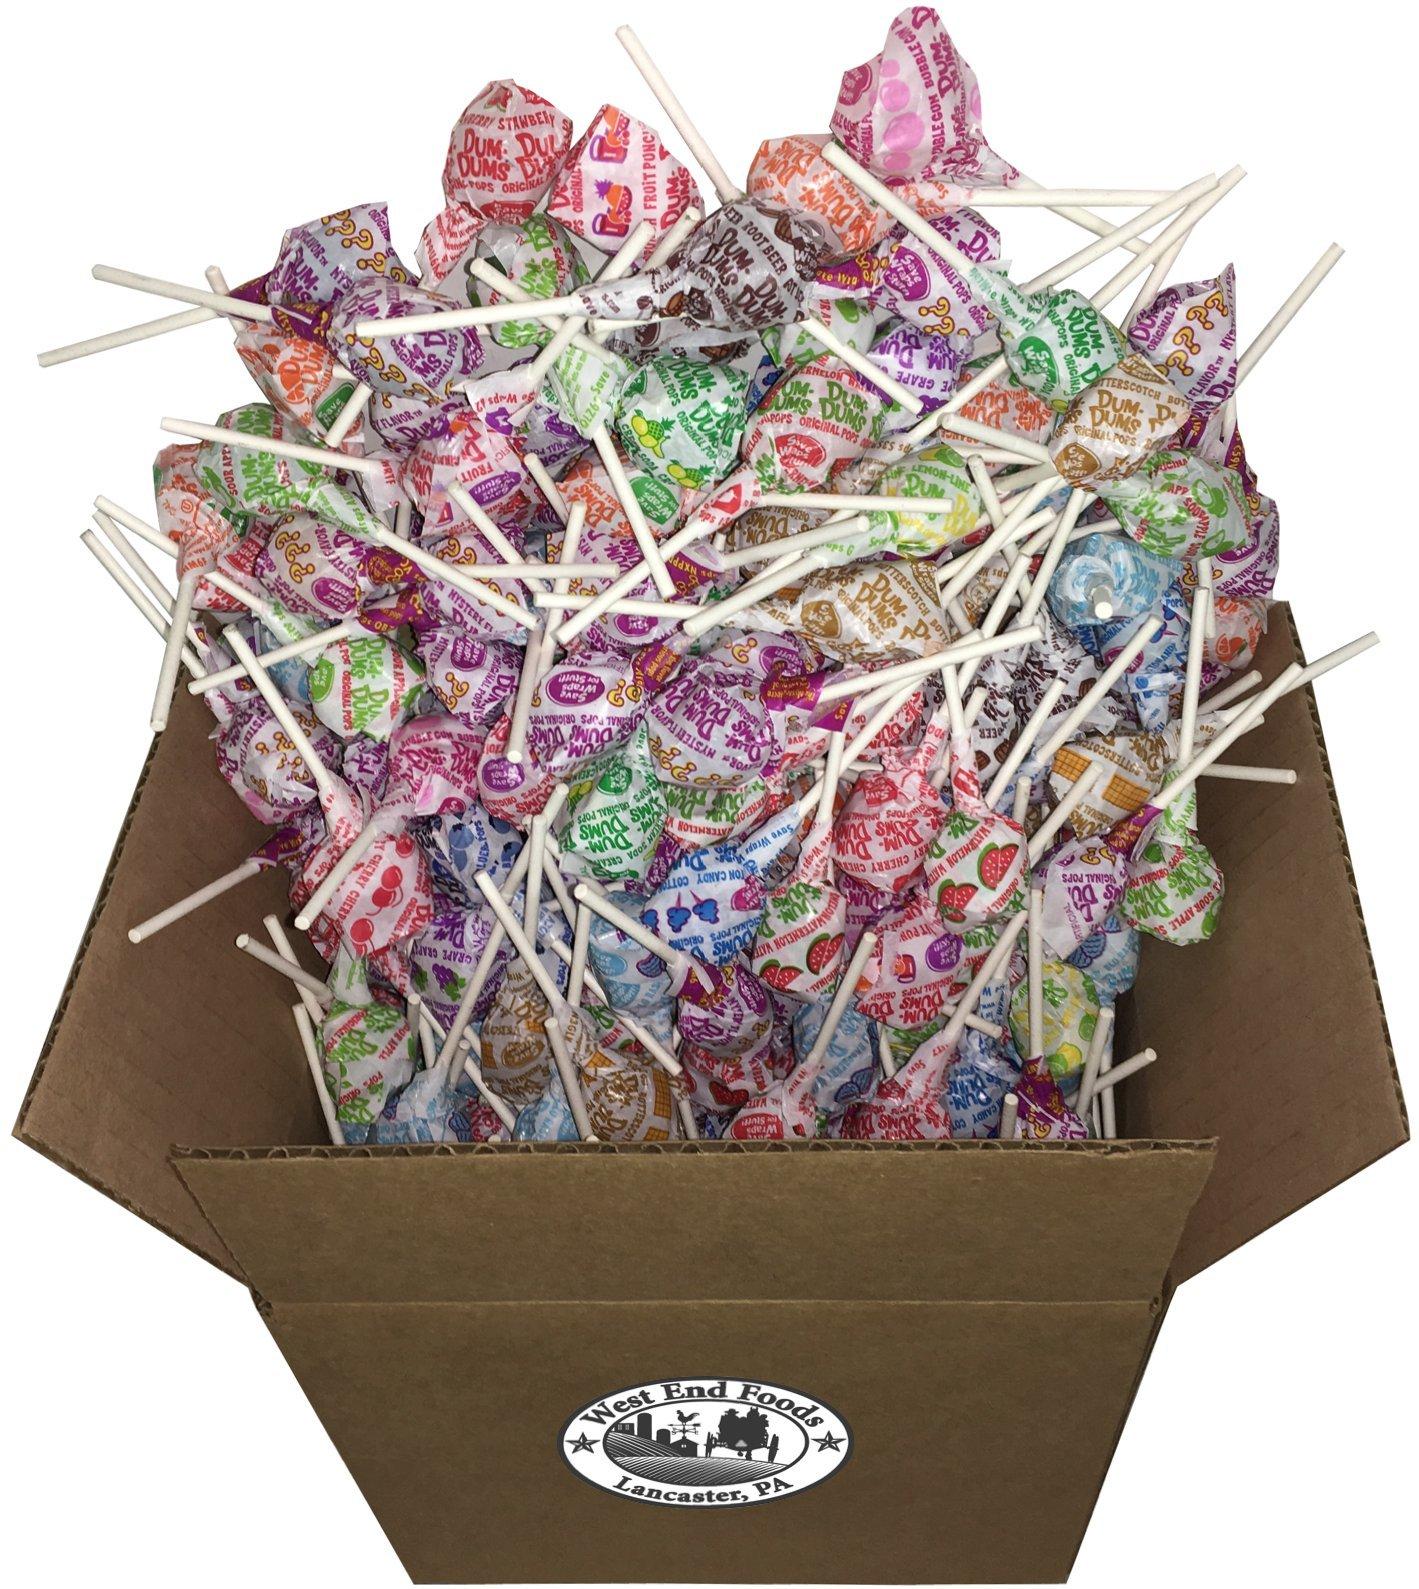 Bulk Assorted Dum Dums Lollipops Candy (5 lbs) by West End Foods (Image #3)